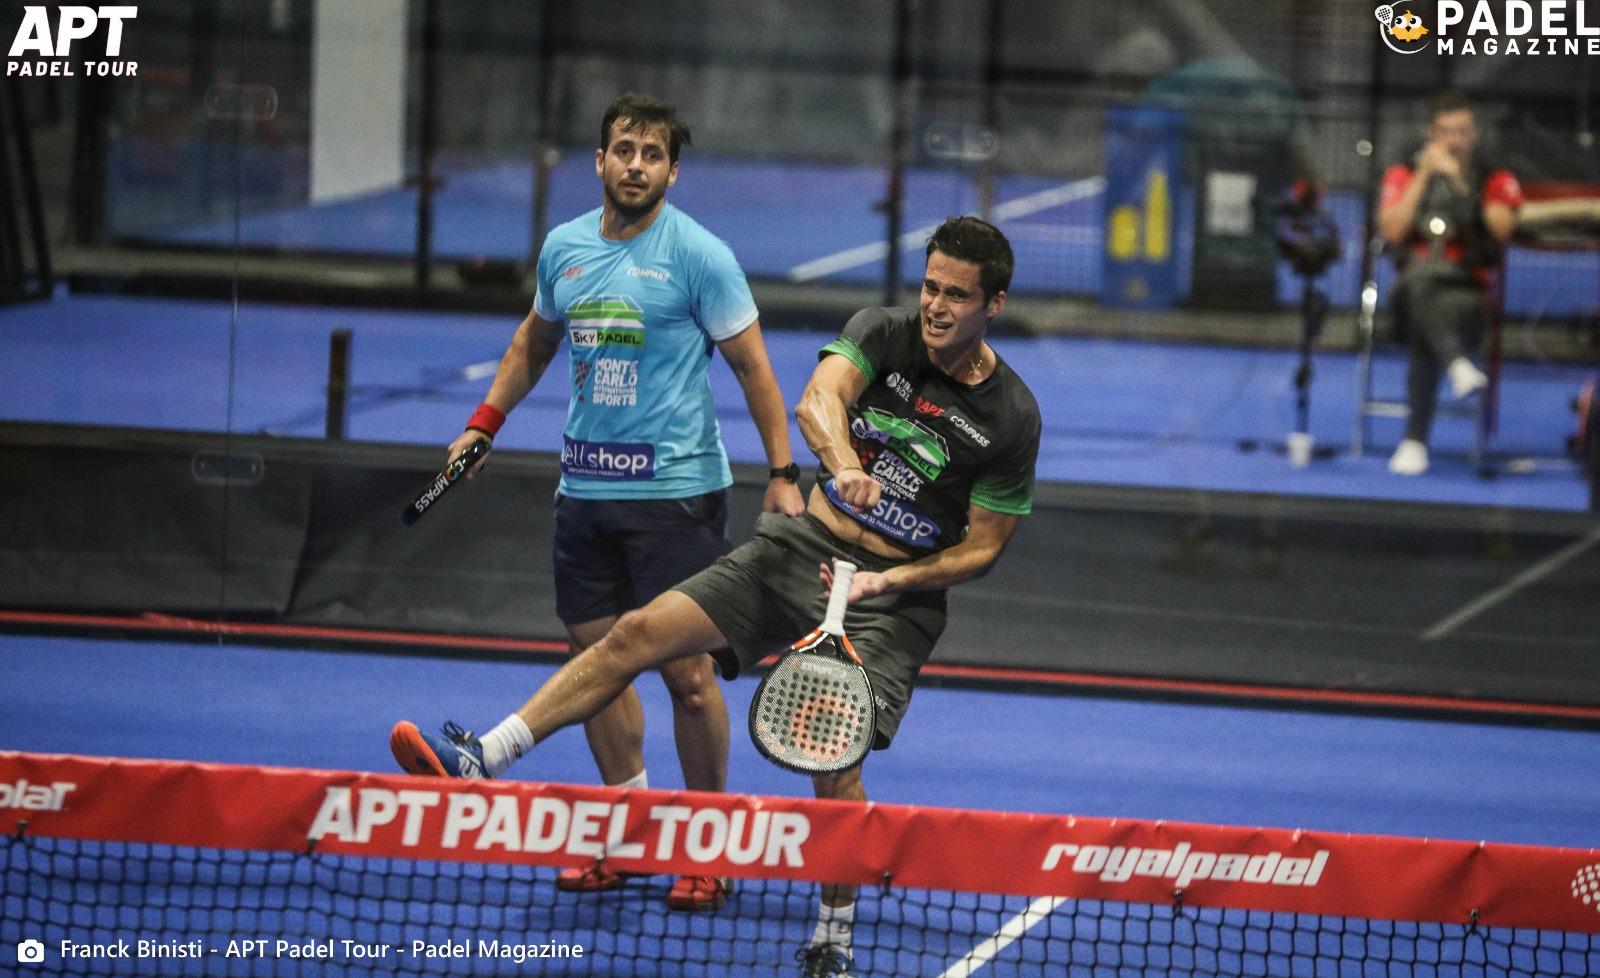 Kungsbacka Open II- Julianoti / Flores - Almada / Bejarano